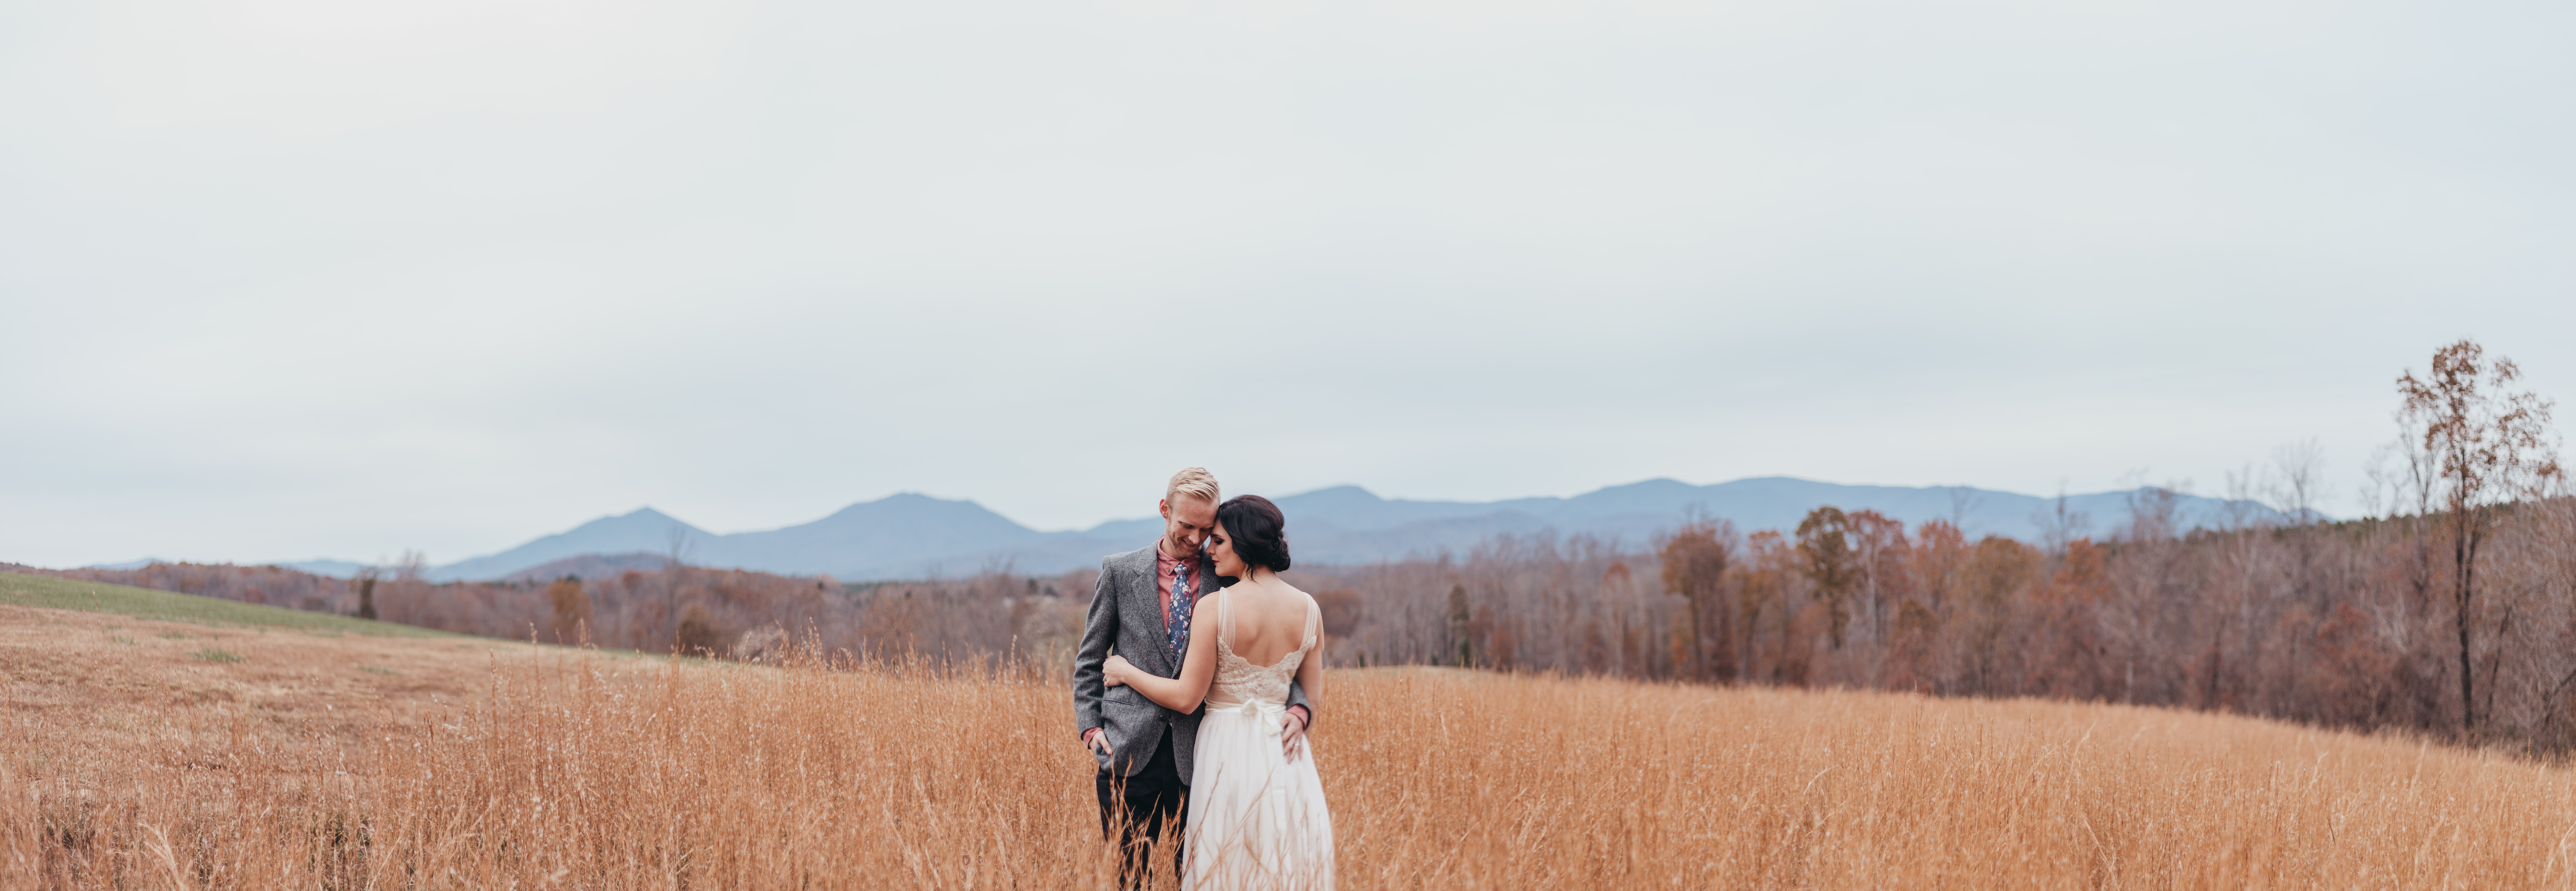 Lauren & Greg - Sierra Vista - Amative Creative-112.jpg